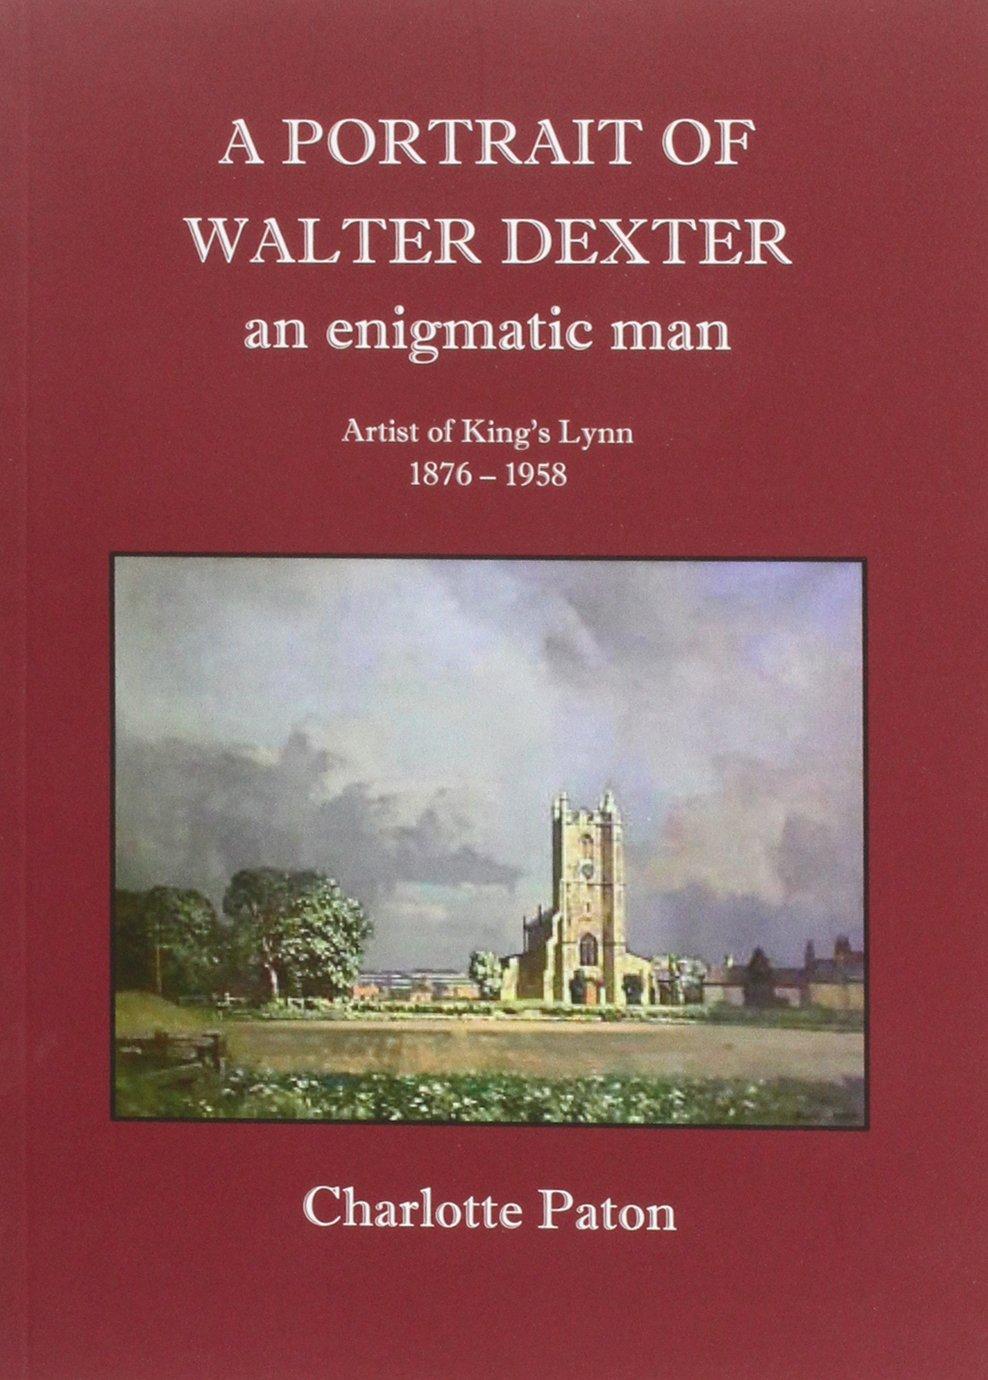 A Portrait of Walter Dexter an Enigmatic Man: Artist of King's Lynn 1876 - 1958 PDF